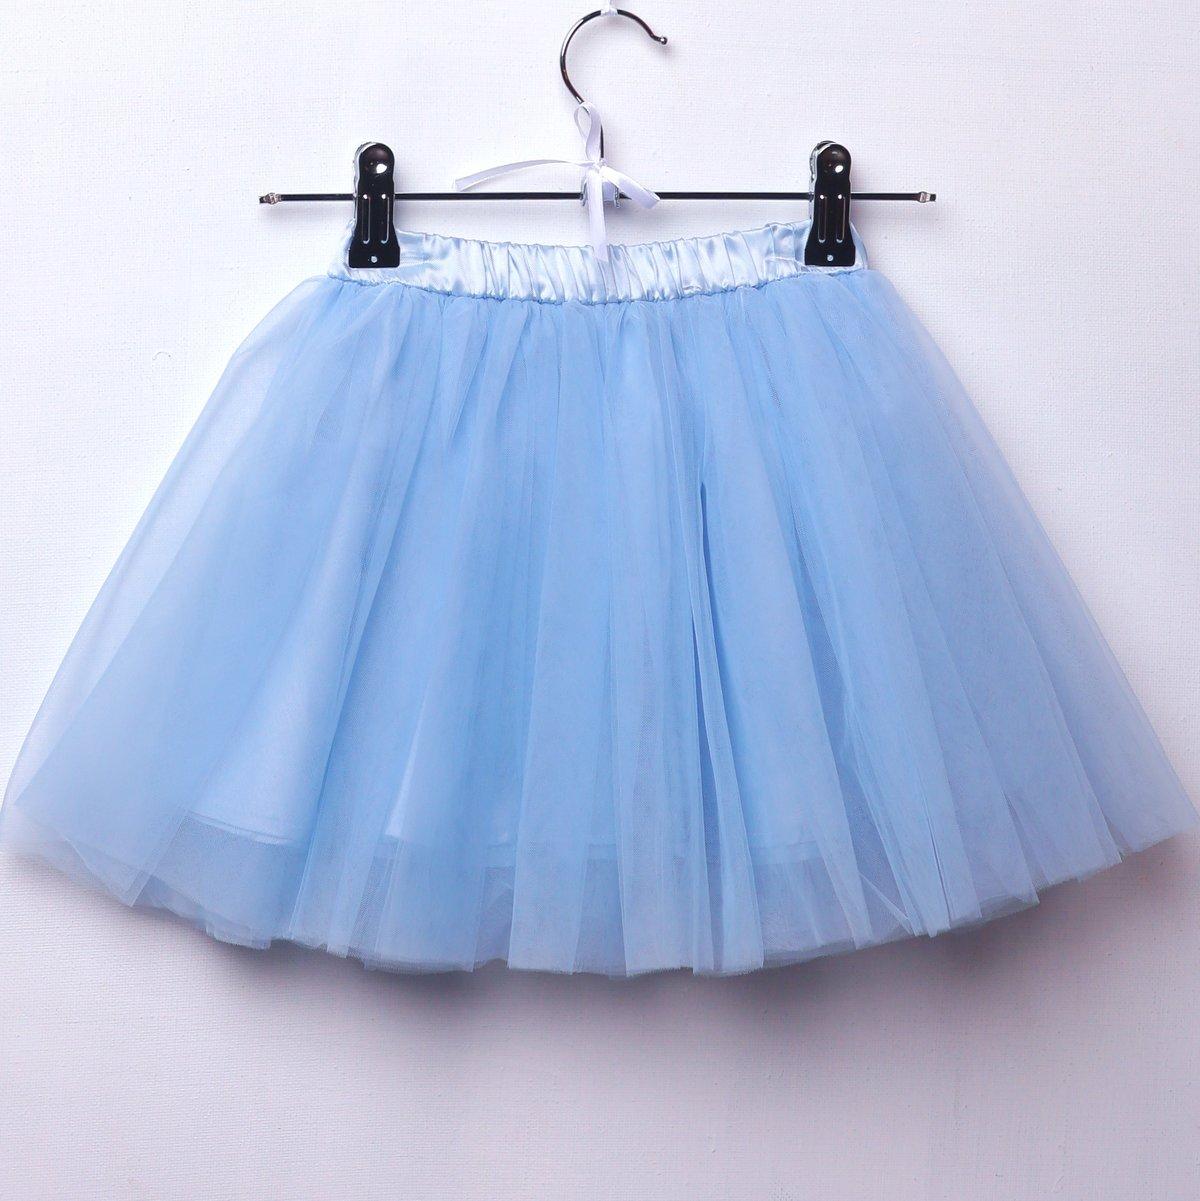 Как сшить юбки из фатина фото 88